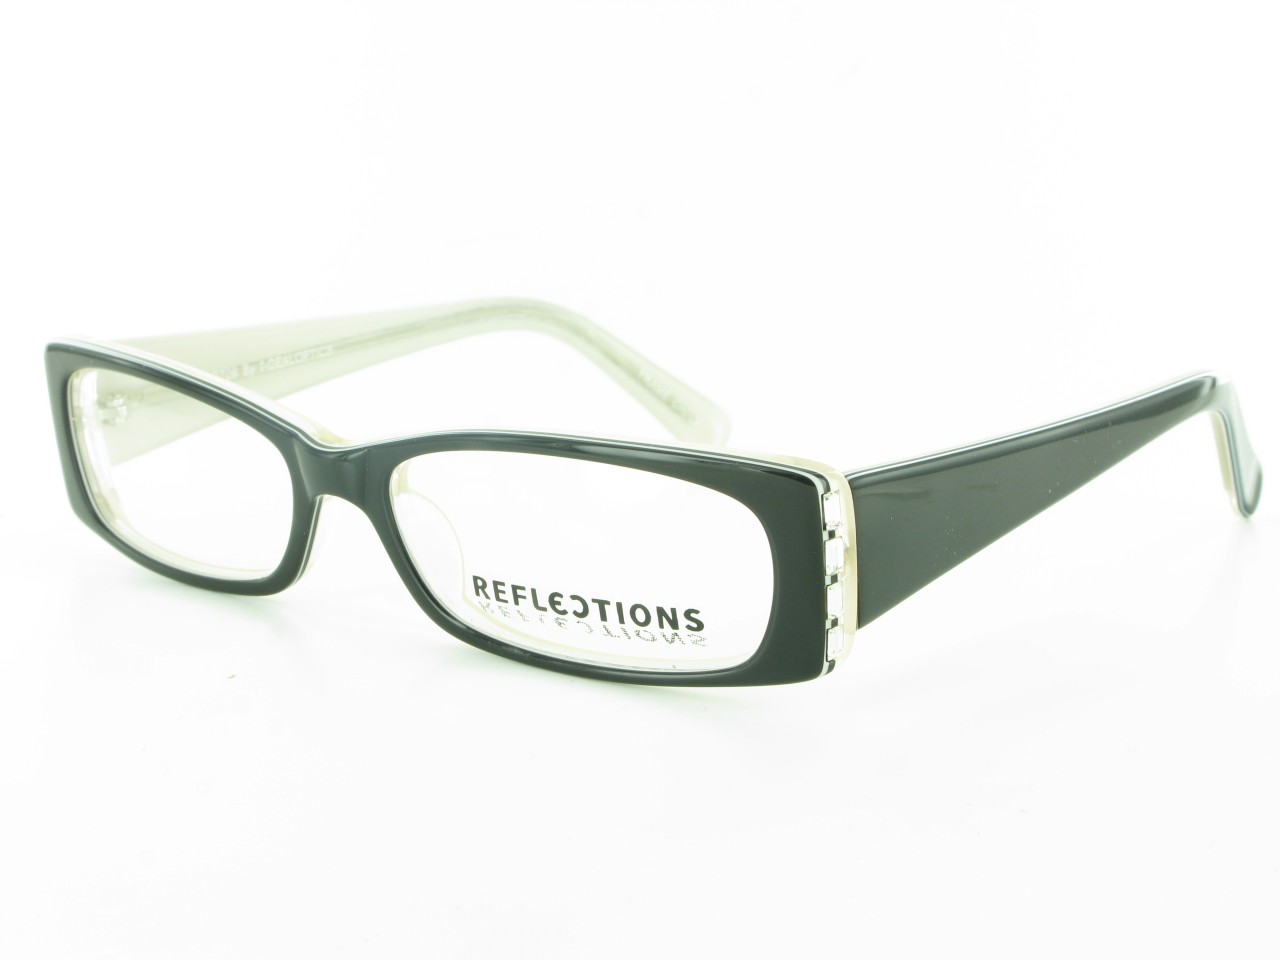 Ladies Plastic Eyeglass Frames : REFLECTIONS Classy Plastic Rhinestone Ladies EYEGLASS ...